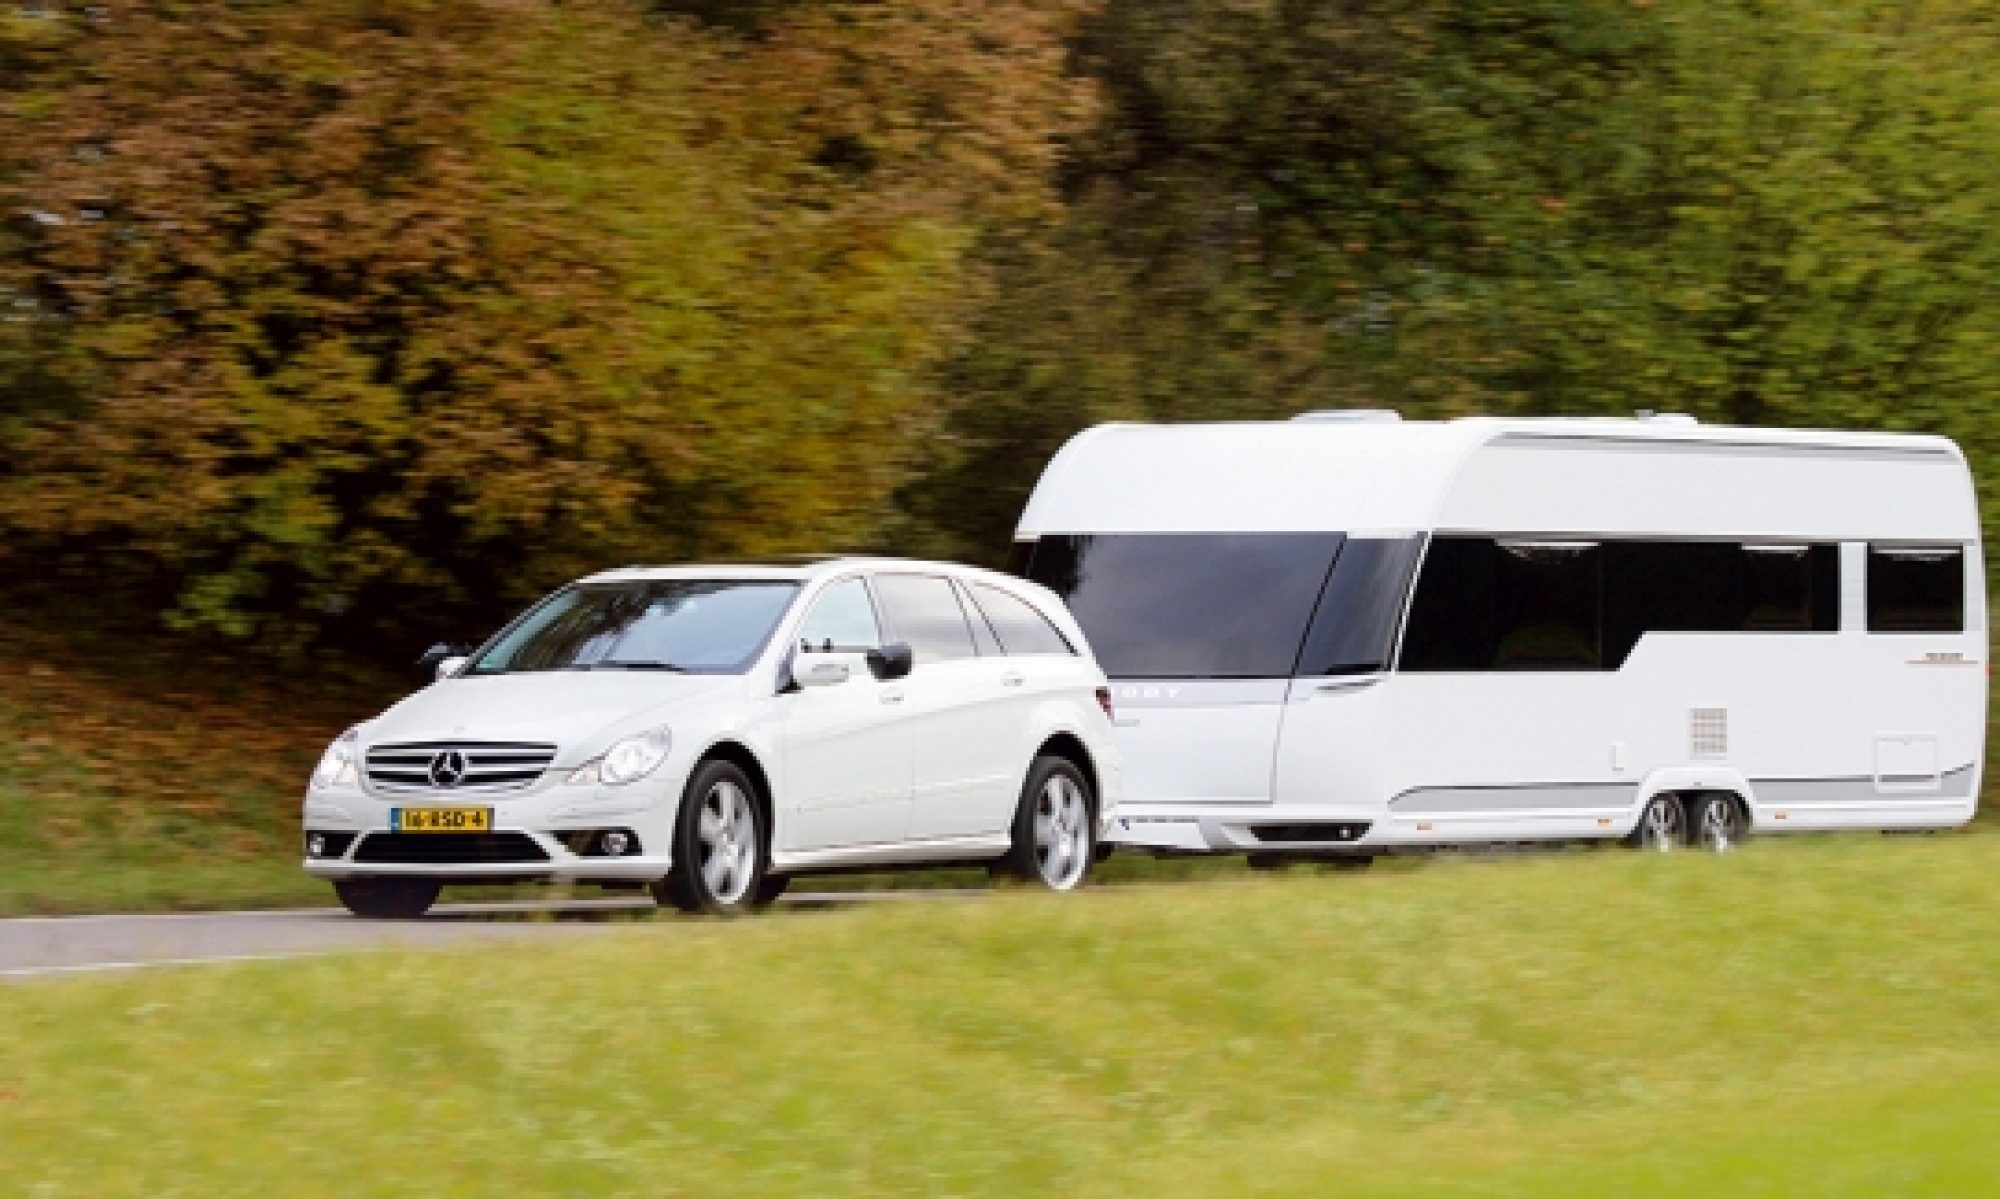 JOBU caravans